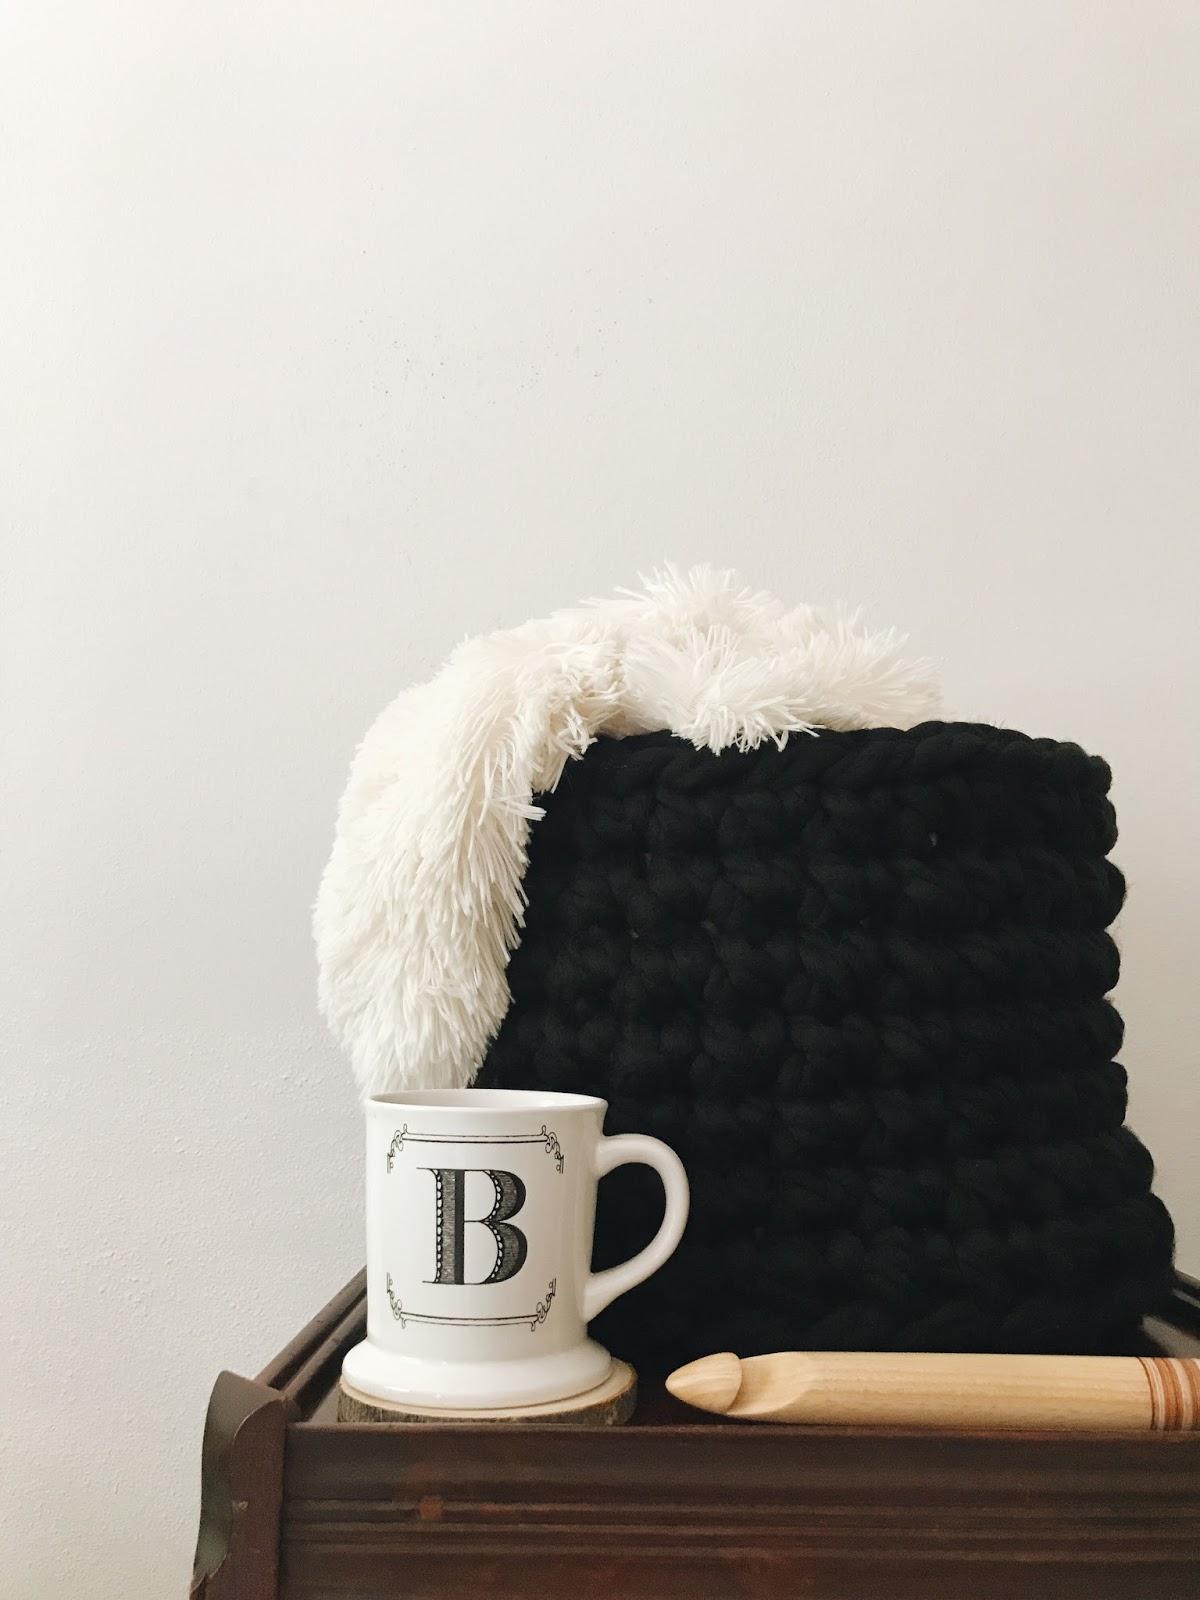 Brenna Ann Handmade: The 30 Minute Jumbo Hook + Yarn Crochet